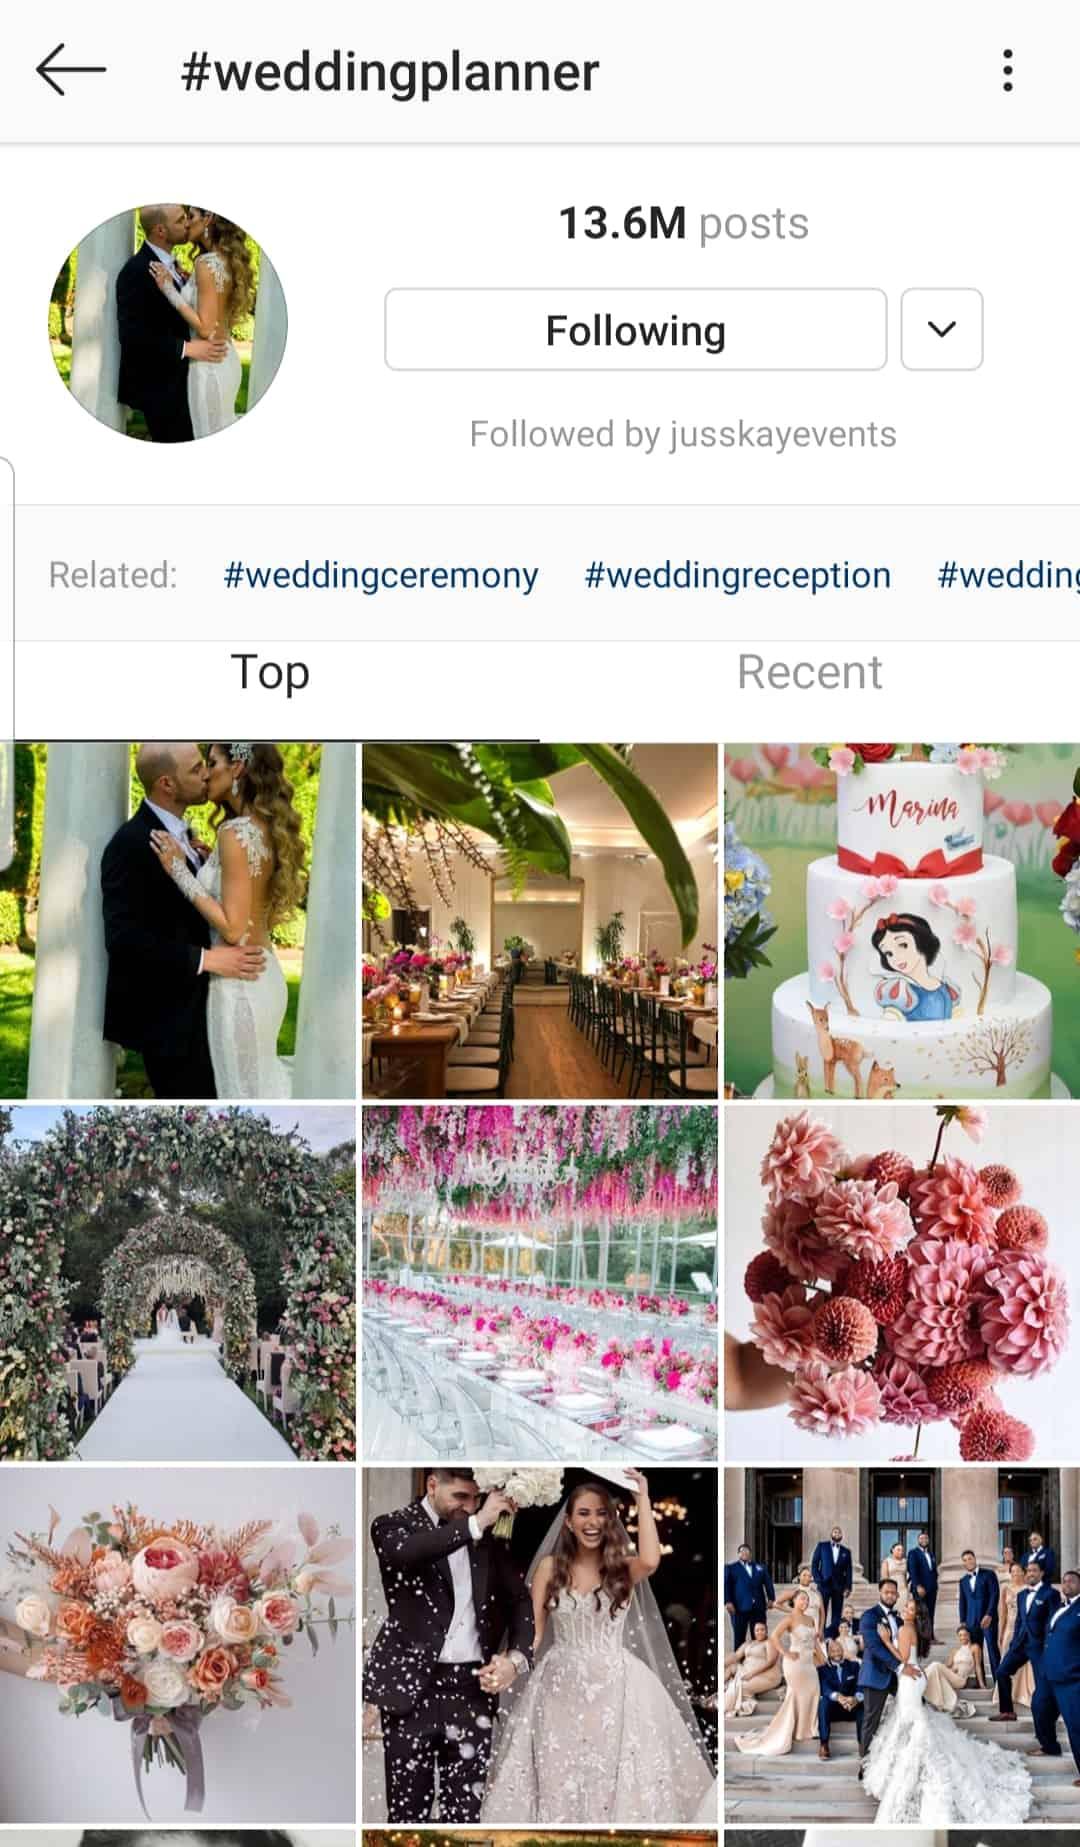 wedding planner hashtag fail